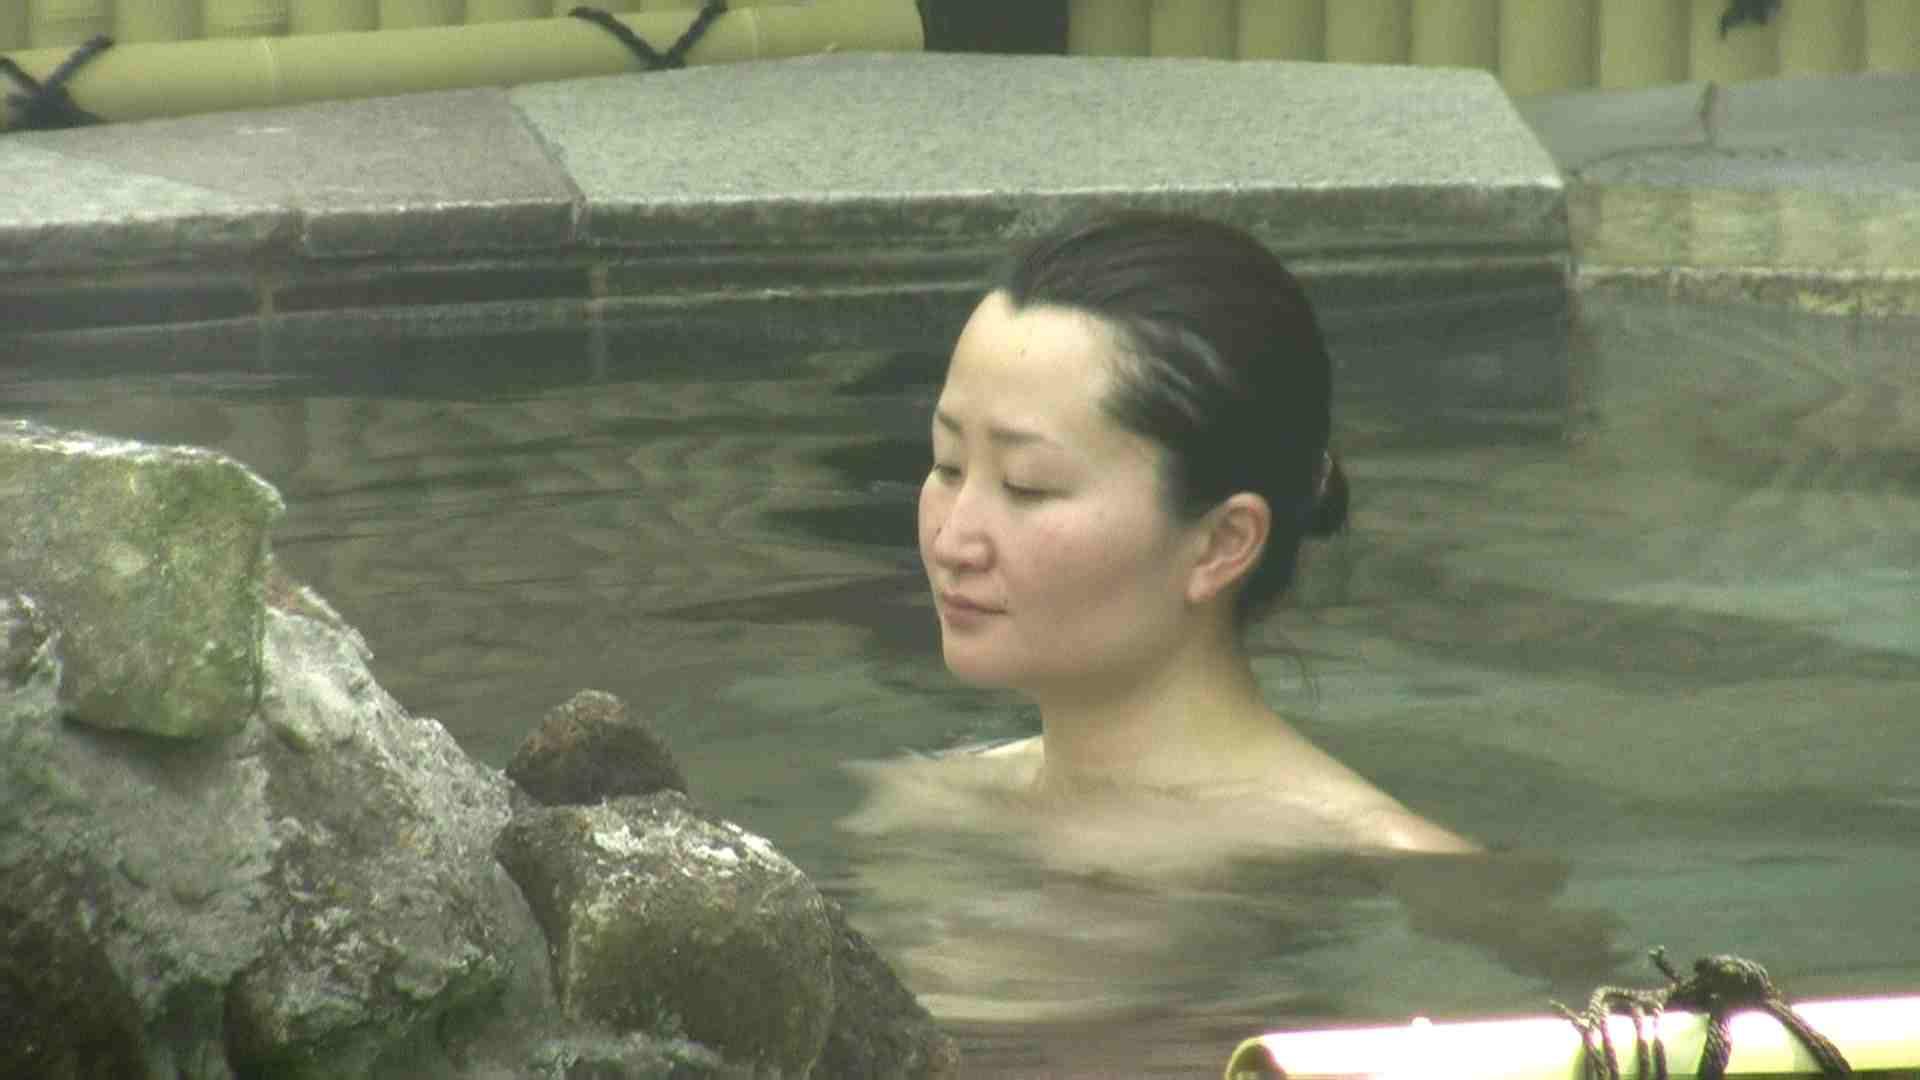 Aquaな露天風呂Vol.632 盗撮 | OLセックス  70画像 25